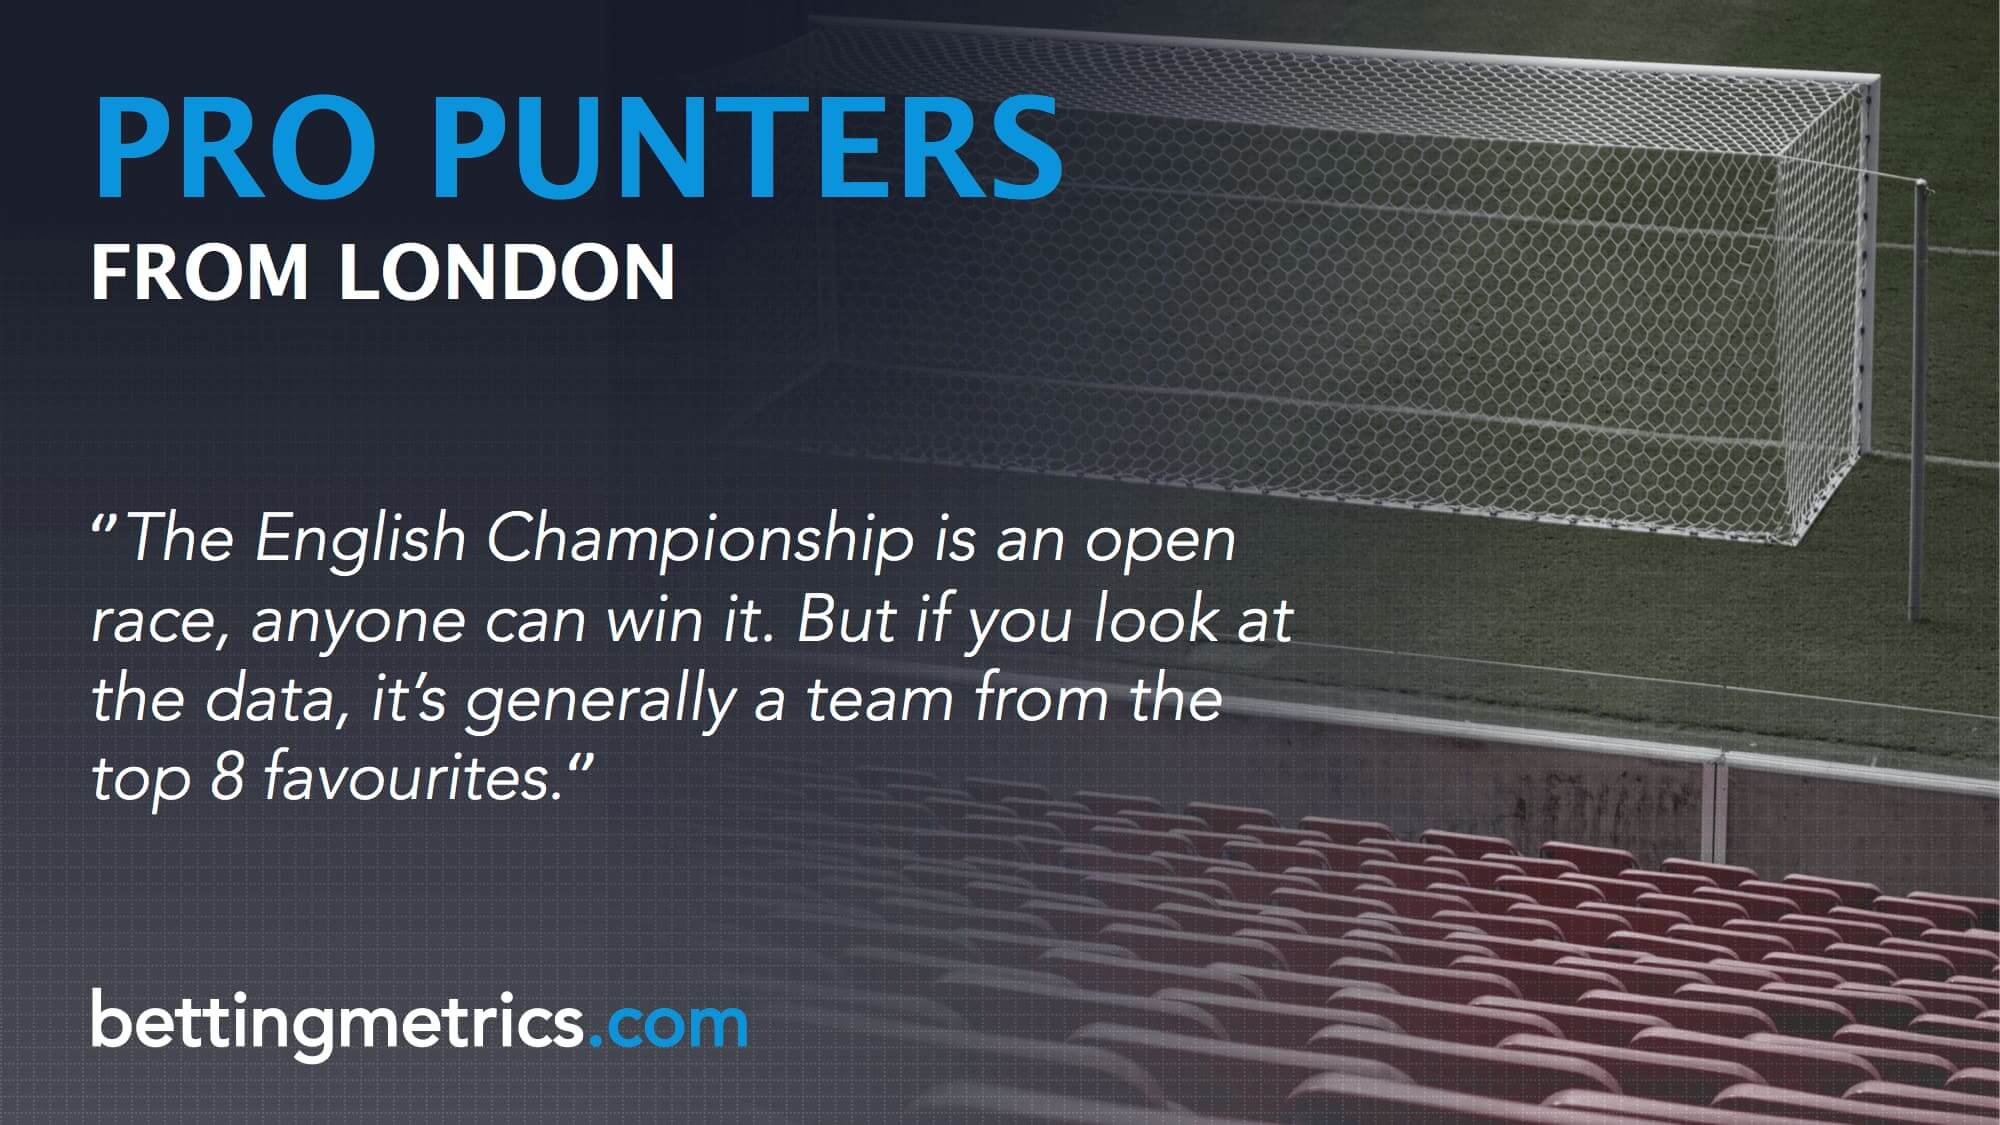 Bettingmetrics bet tracking software interviews professional punters